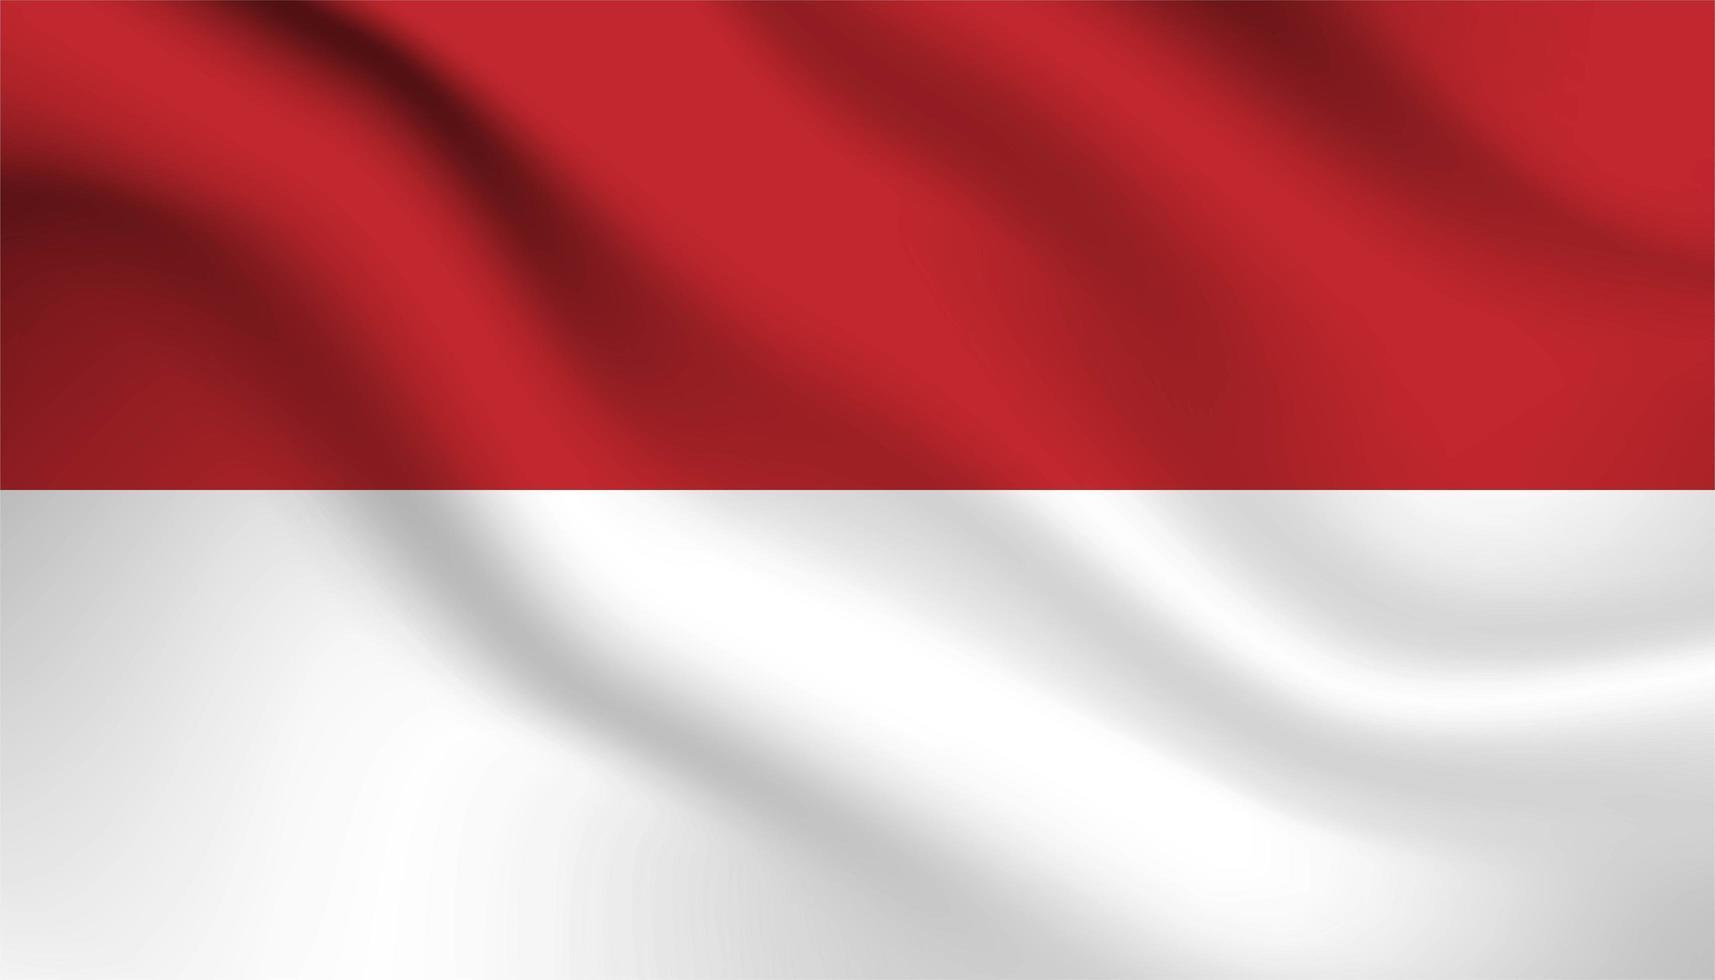 vlag van Indonesië achtergrond vector